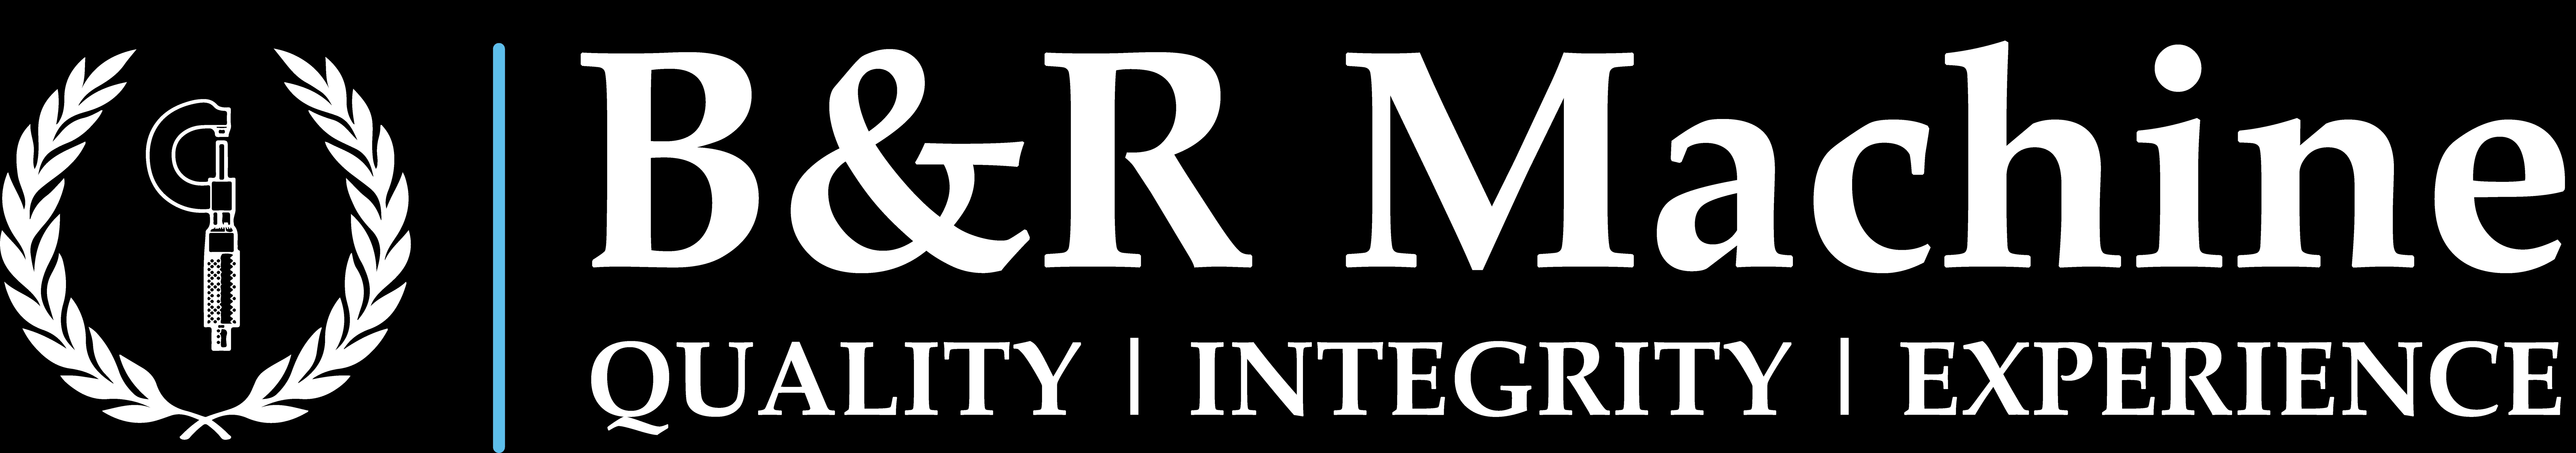 B&R Machine custom machining tooling and repair logo